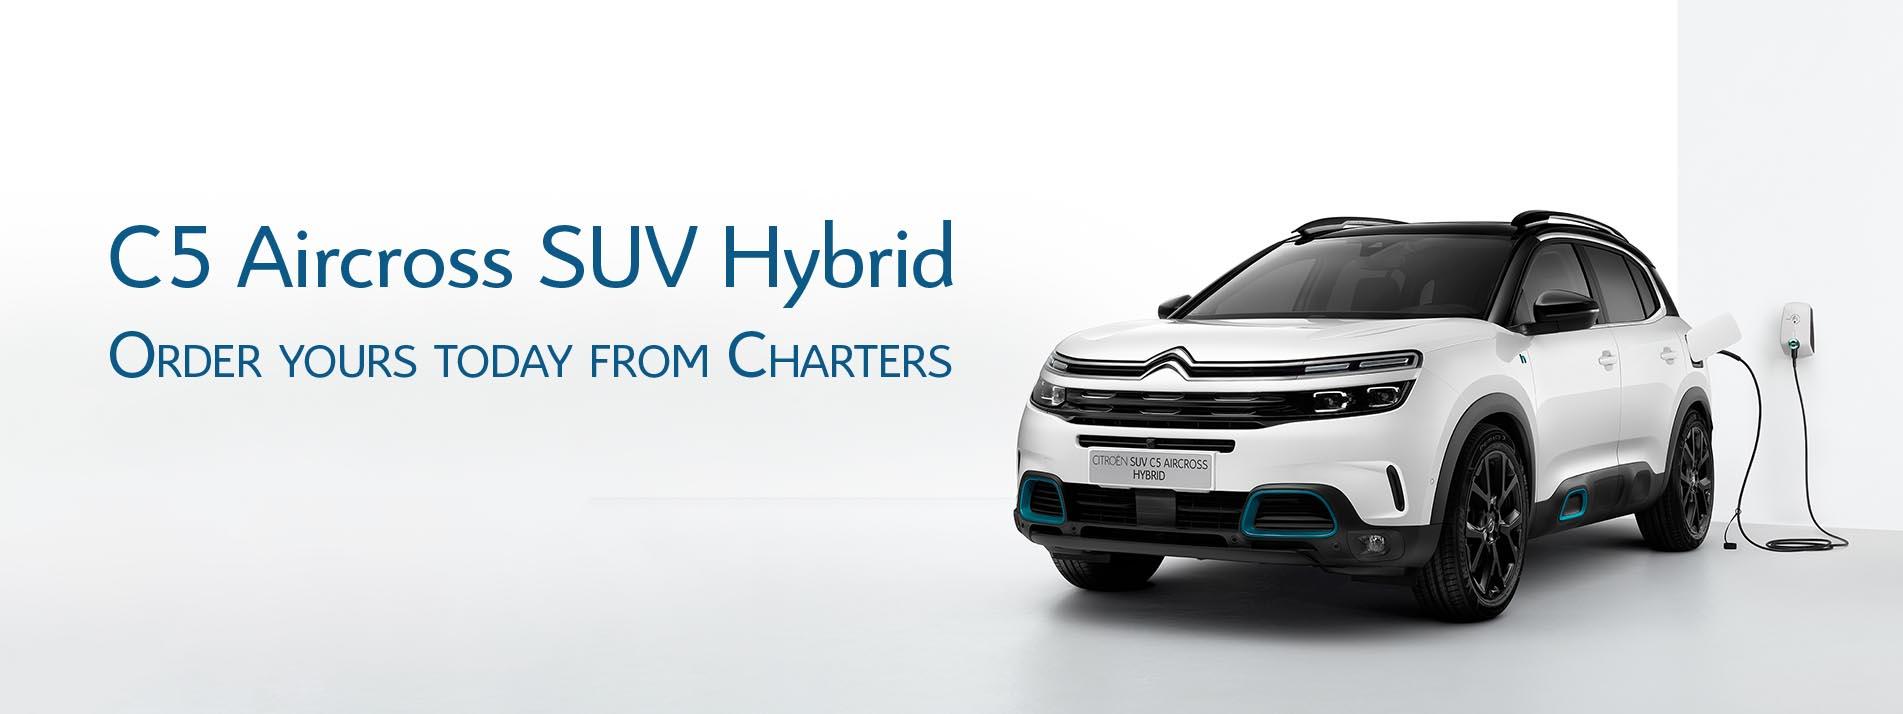 c5-aircross-SUV-hybrid-orders-m-sli